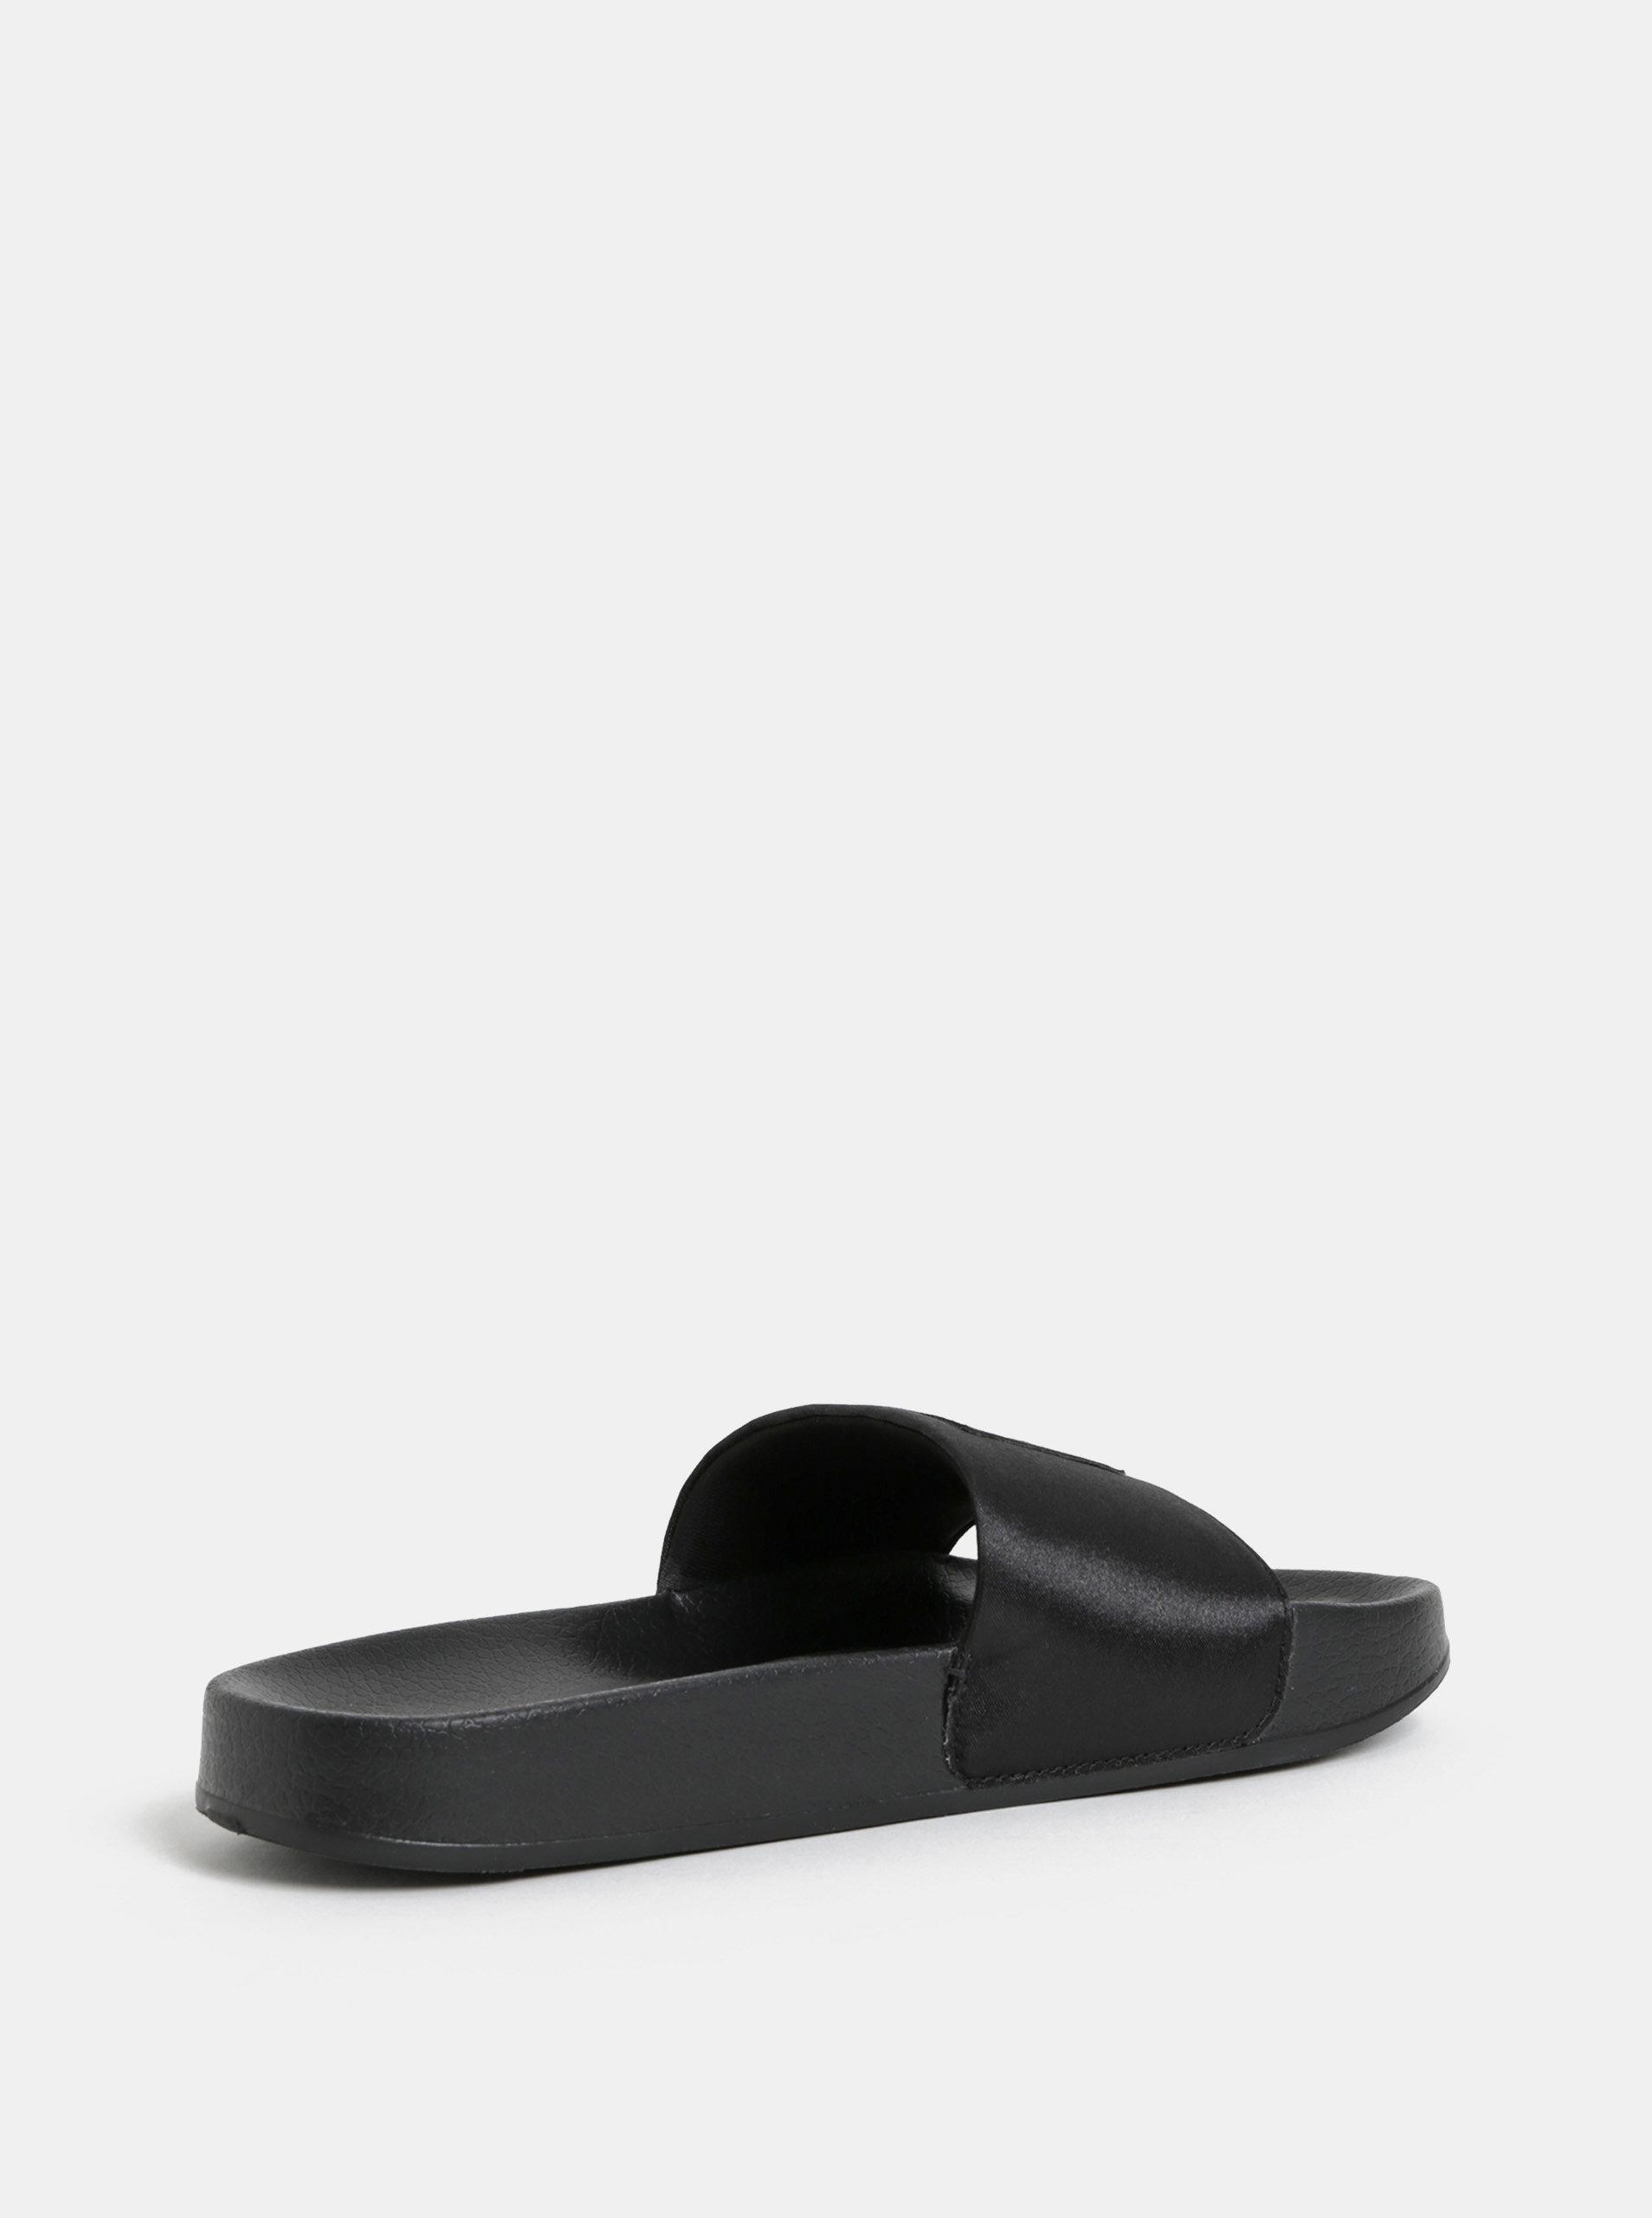 Černé dámské lesklé pantofle s plastickým logem Puma Leadcat ... e490ddeb61